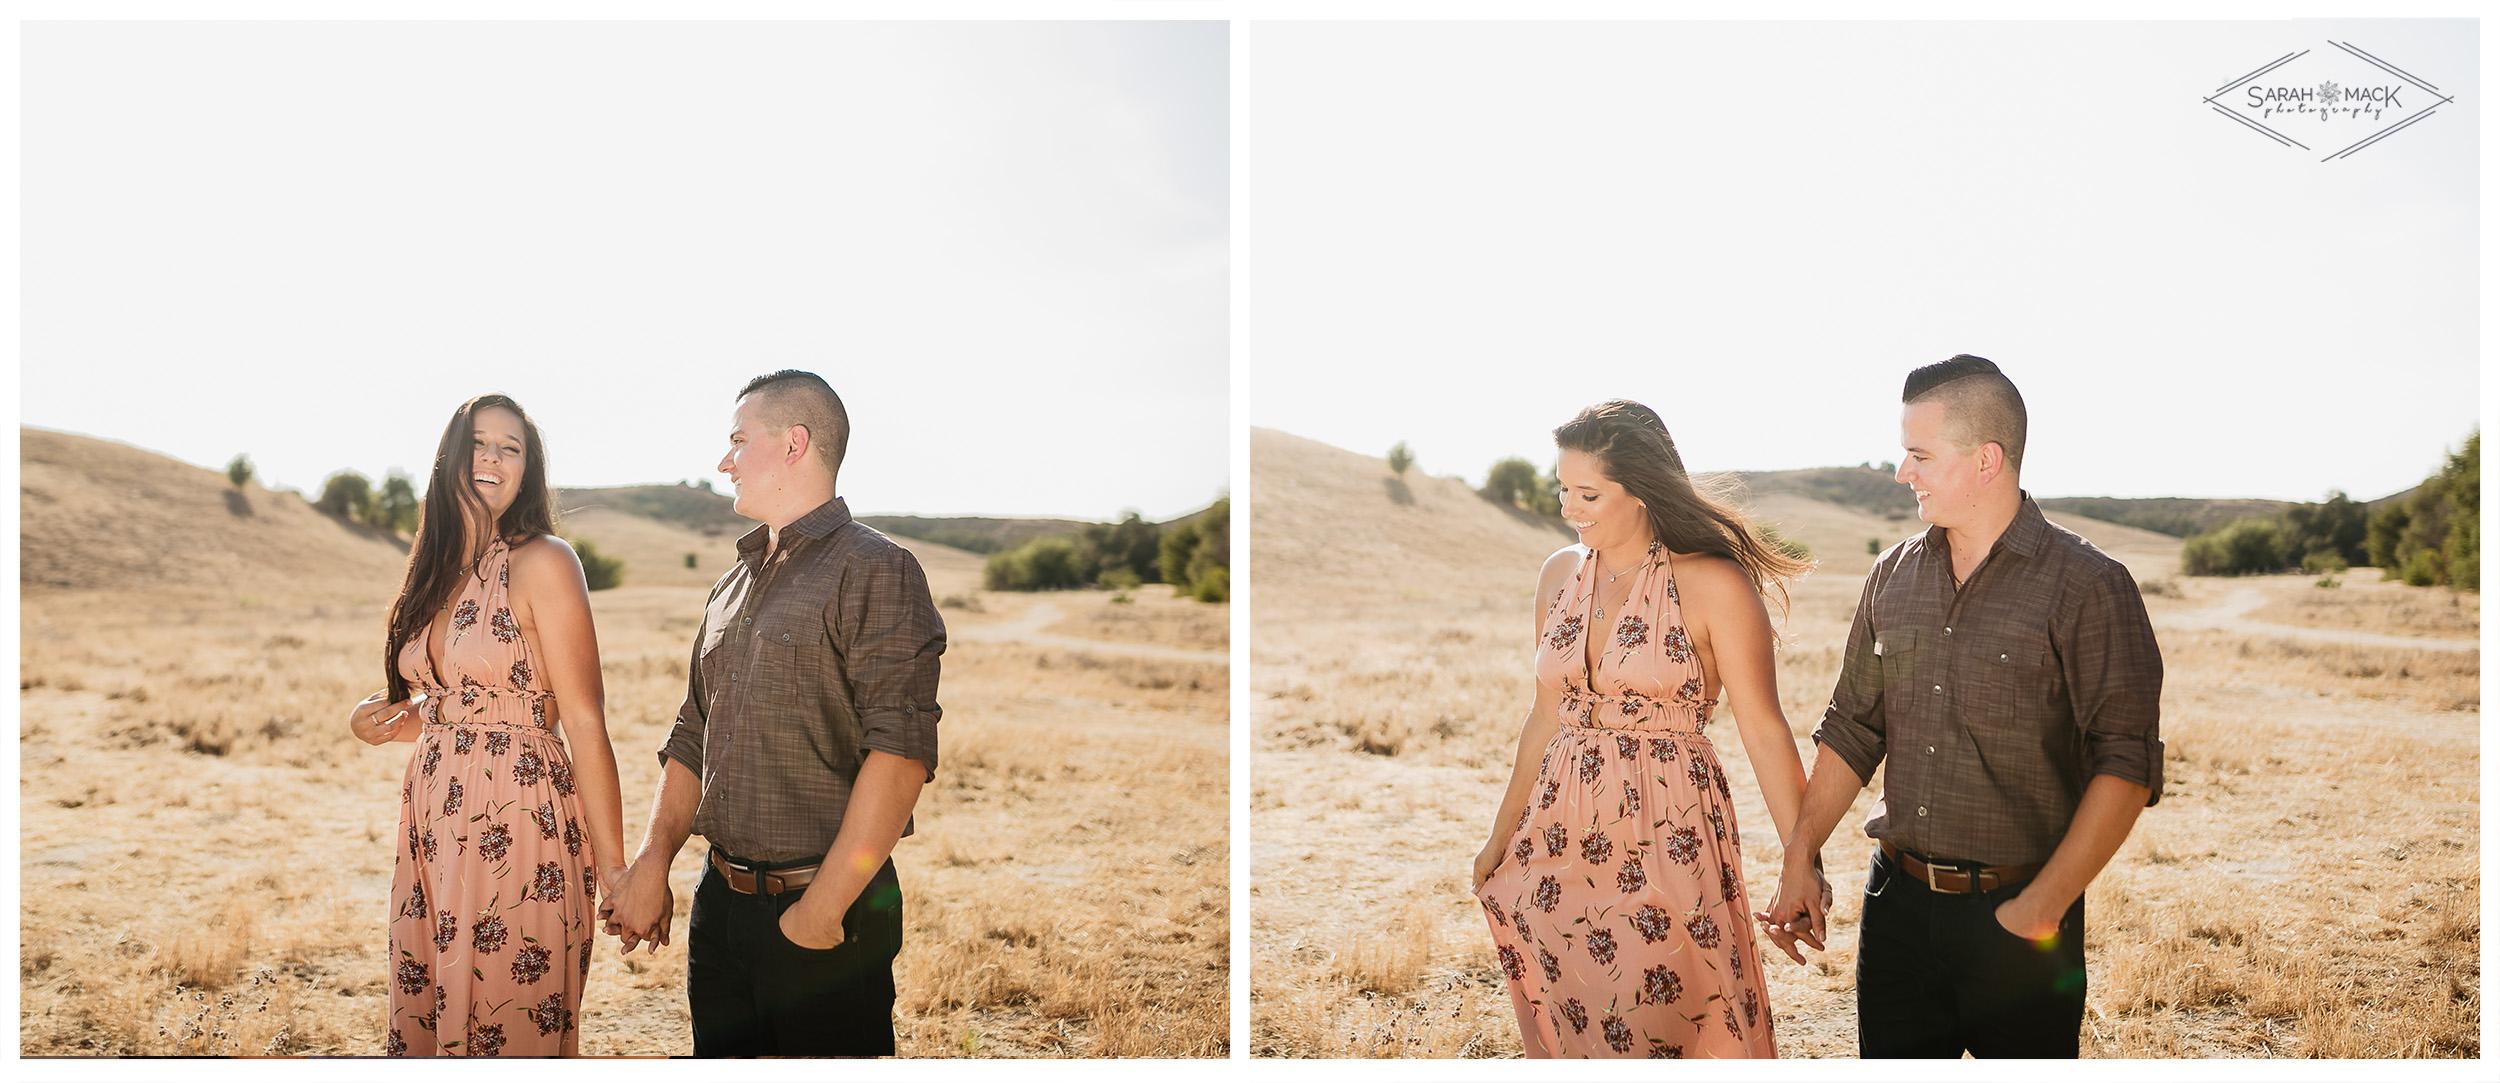 TM-Laguna-Beach-Orange-County-Engagement-Photography-8.jpg